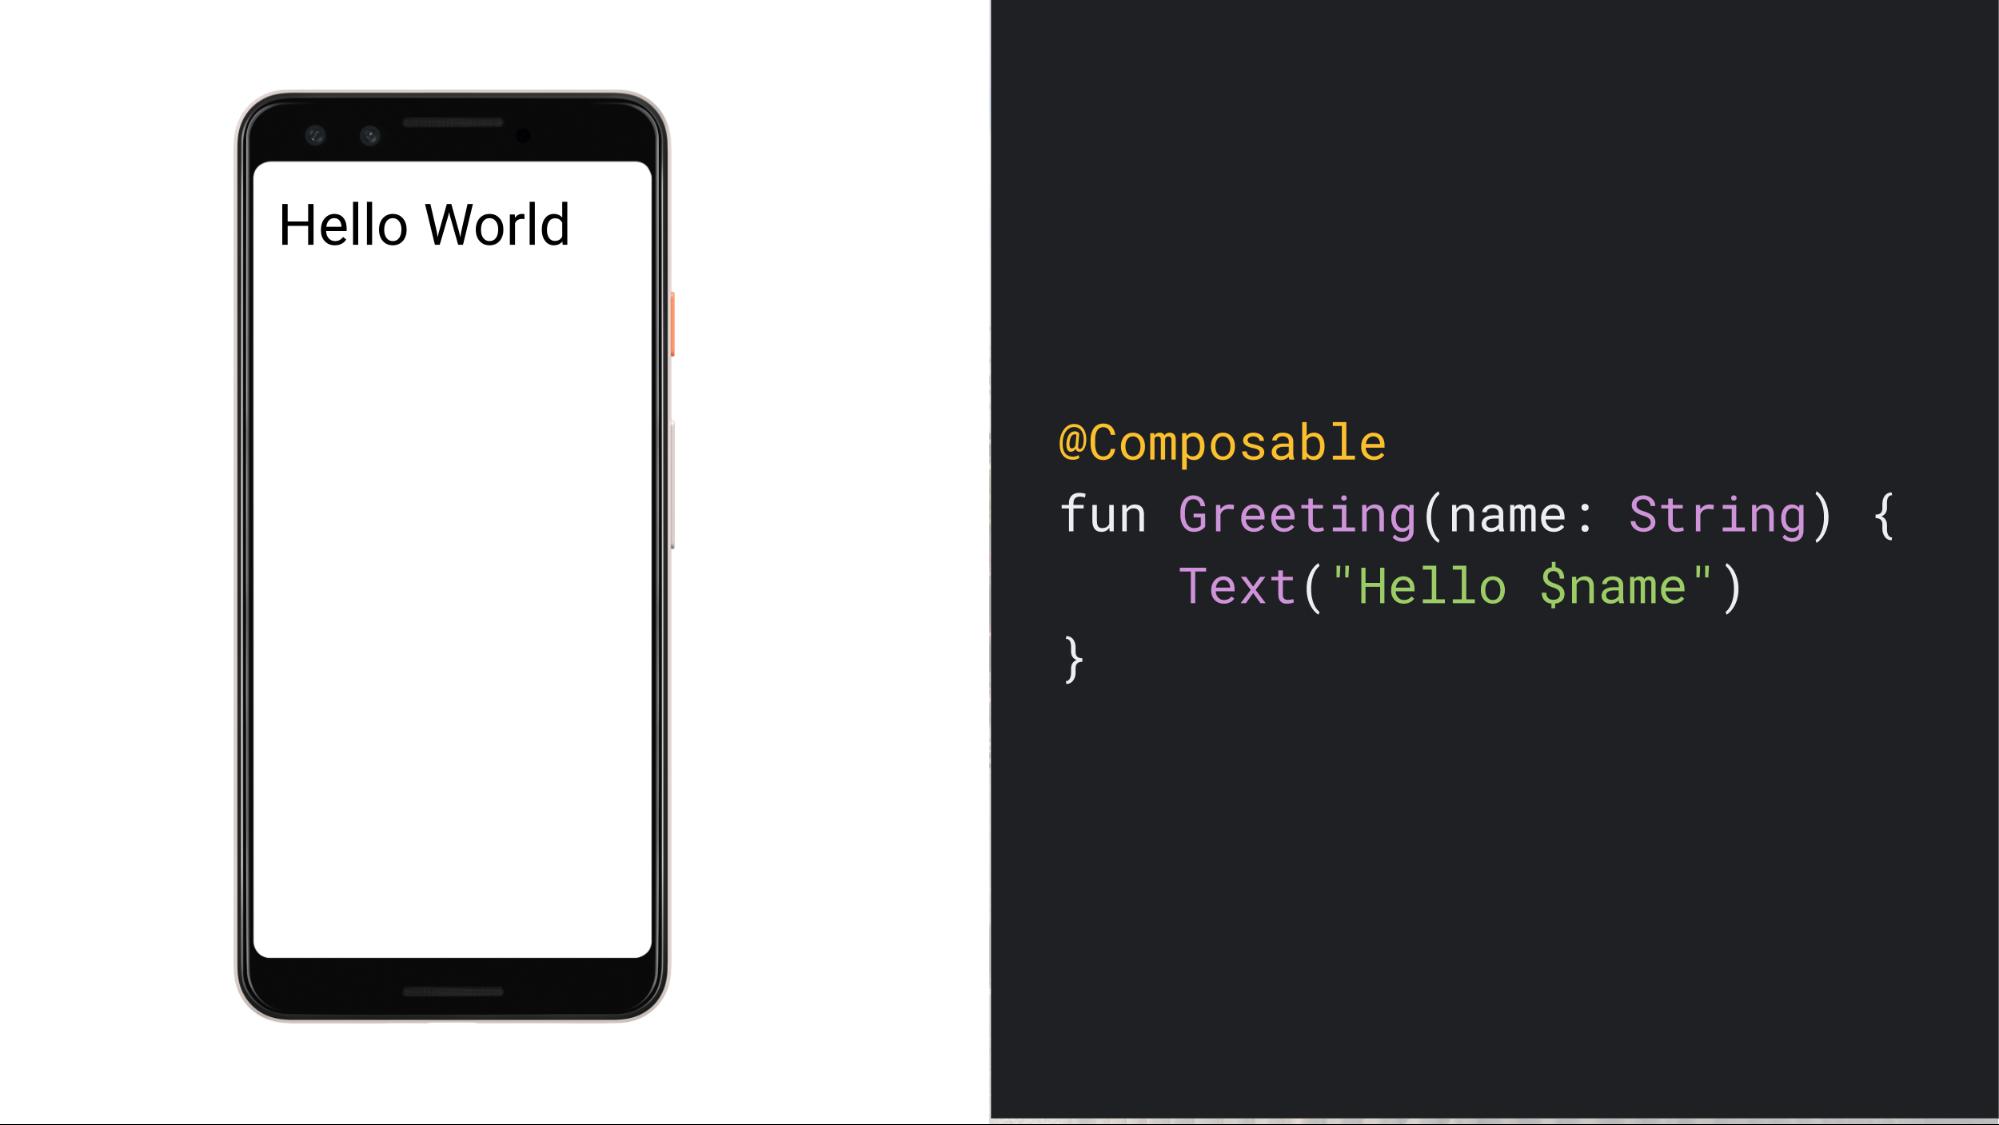 'Hello World'라는 텍스트가 표시된 스마트폰 스크린샷 및 이 UI를 생성하는 간단한 구성 가능한 함수의 코드